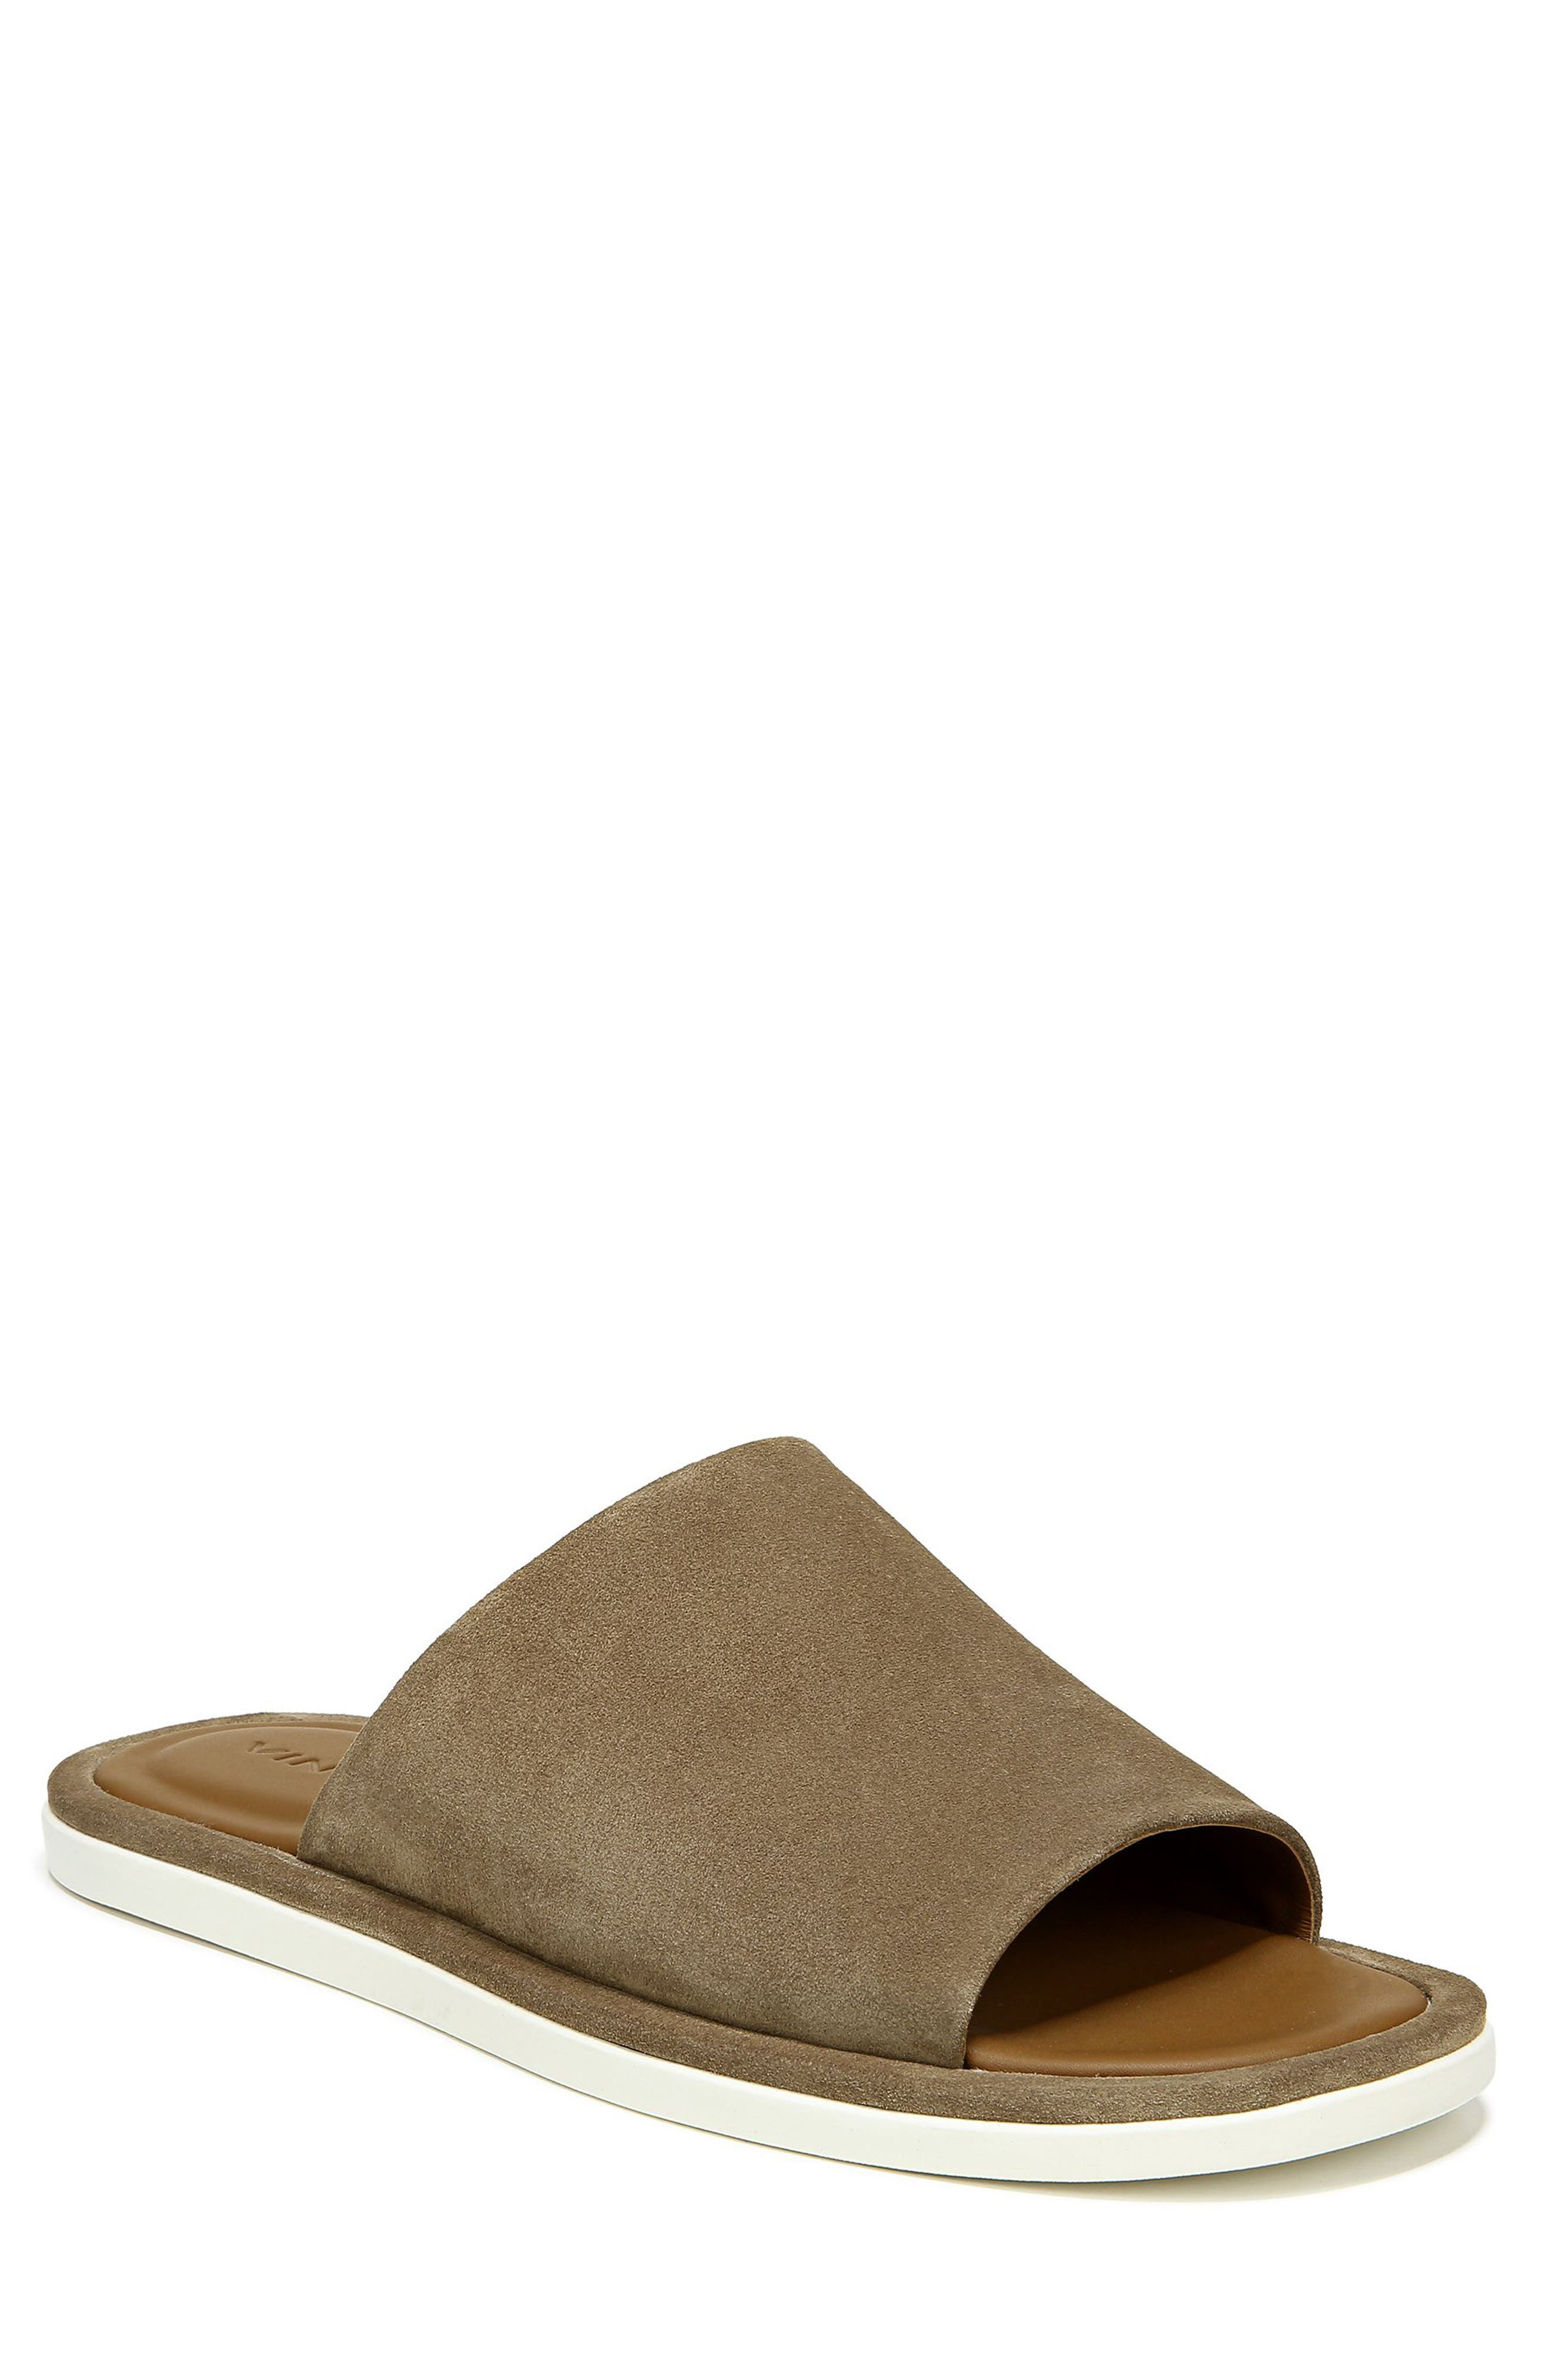 Men's Sandals Sale \u0026 Clearance | Nordstrom